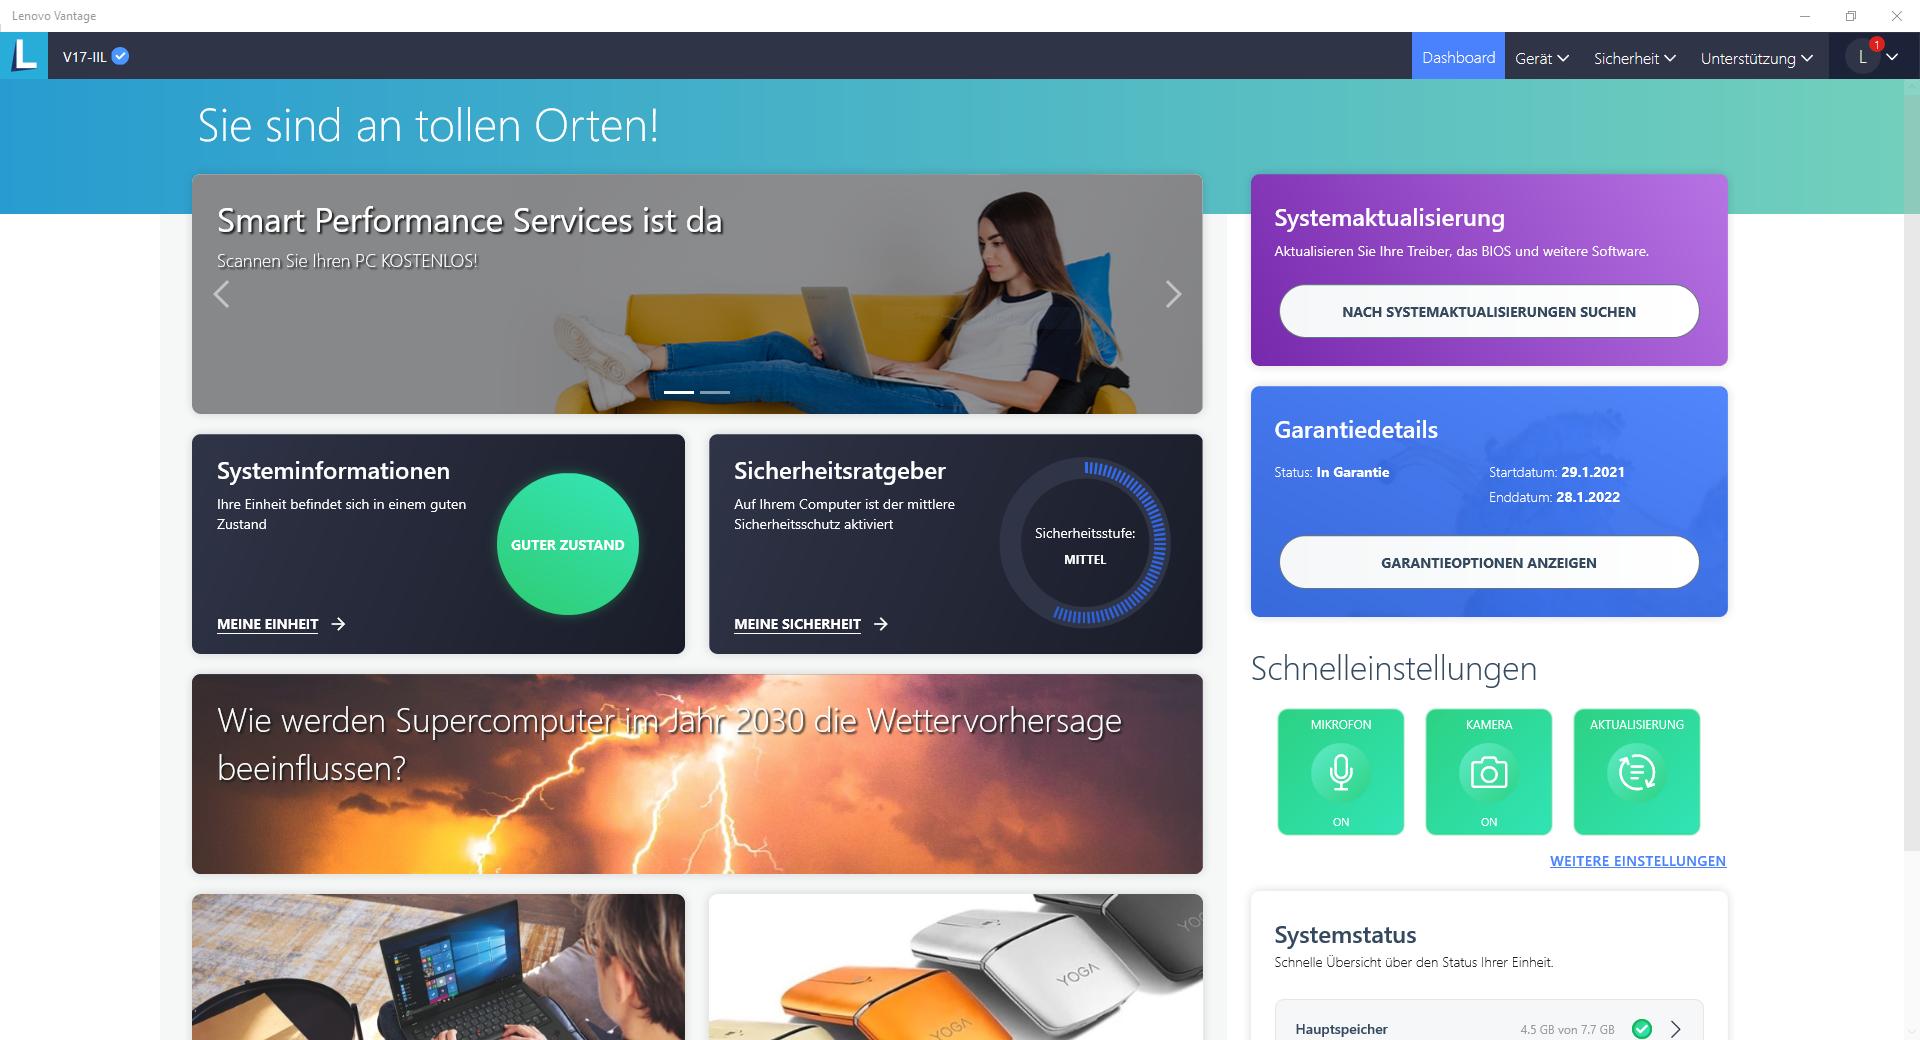 Screenshot Lenovo Vantage